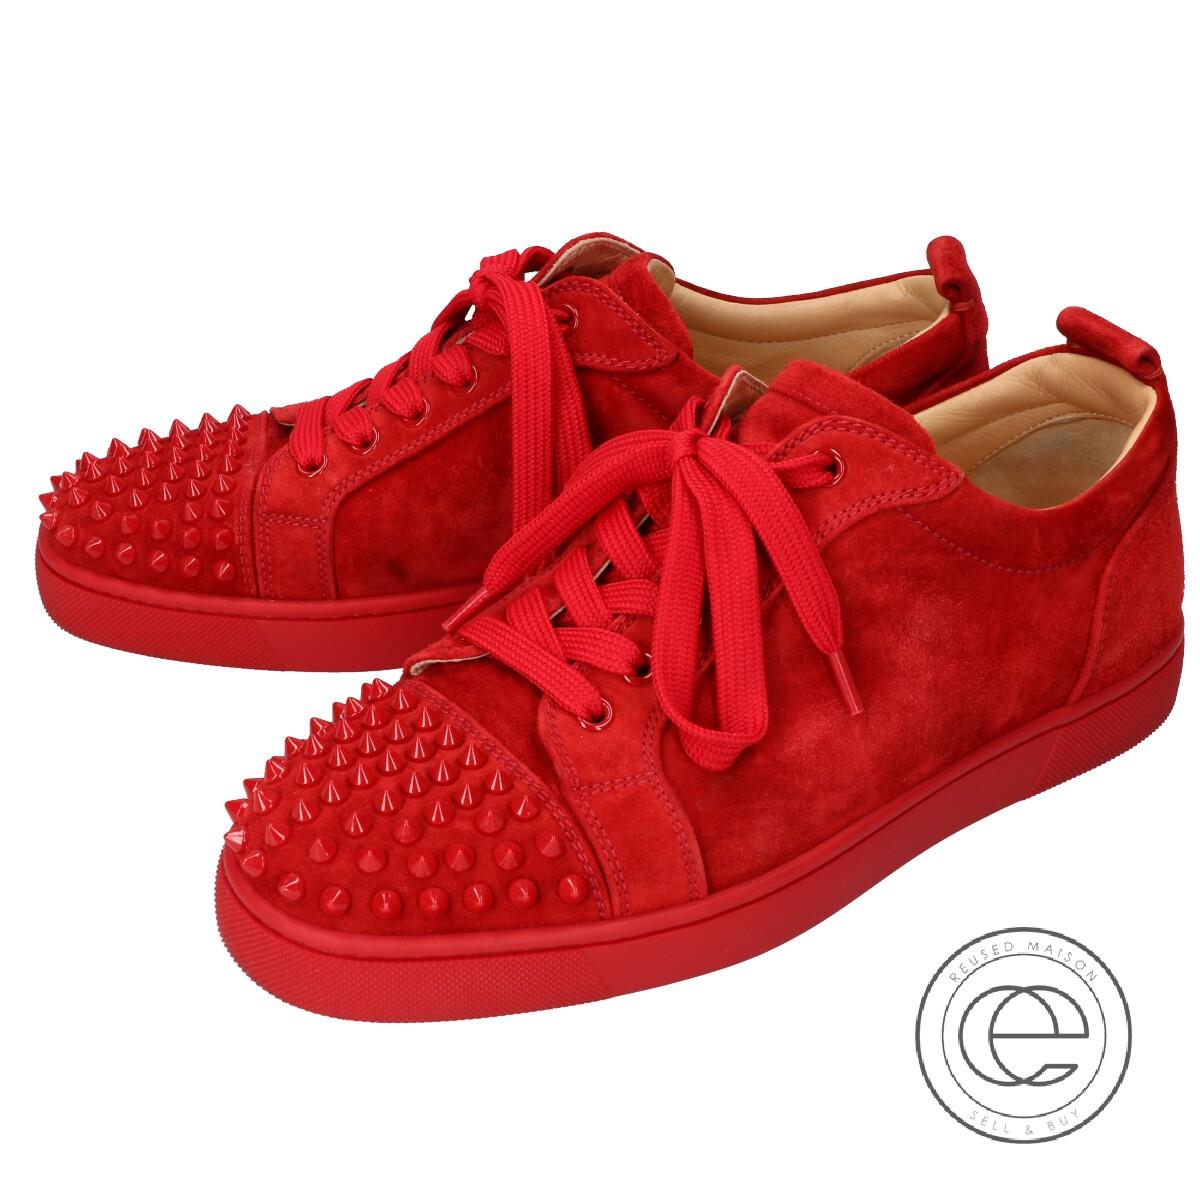 christian louboutin low top sneakers